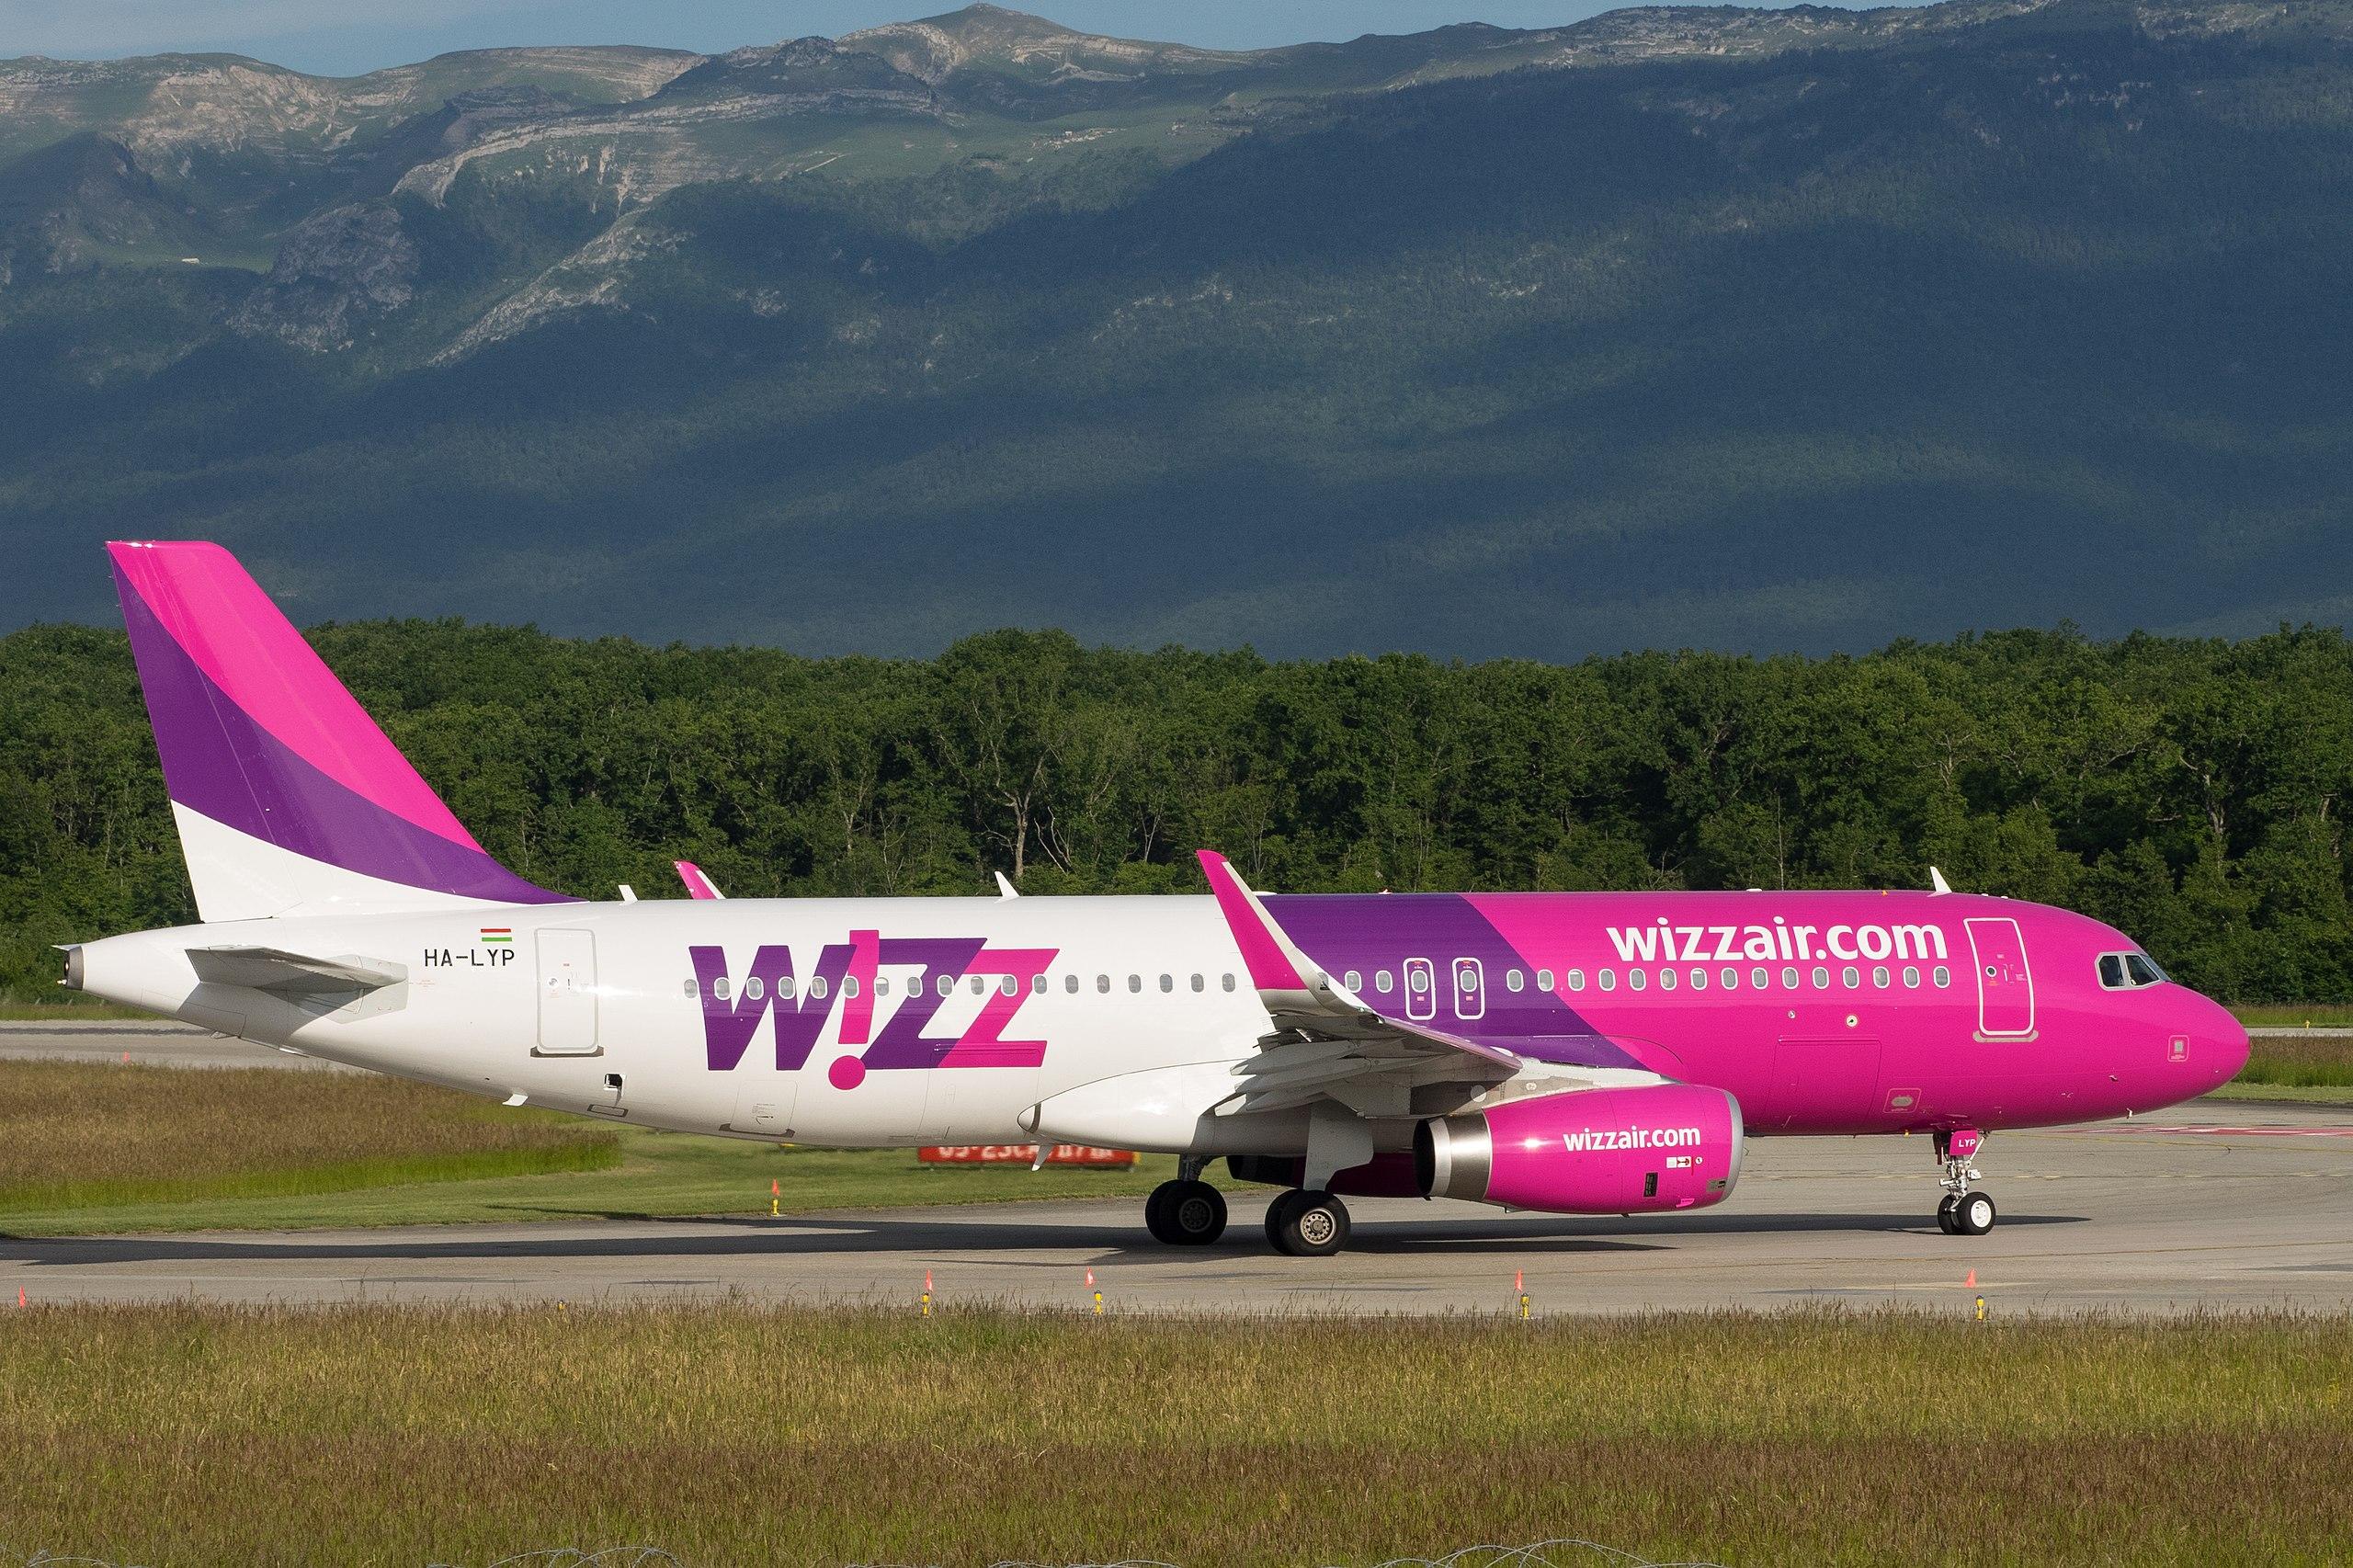 File:HA-LYP, Wizz Air Hungary, Airbus A320-232(WL) (19079423095